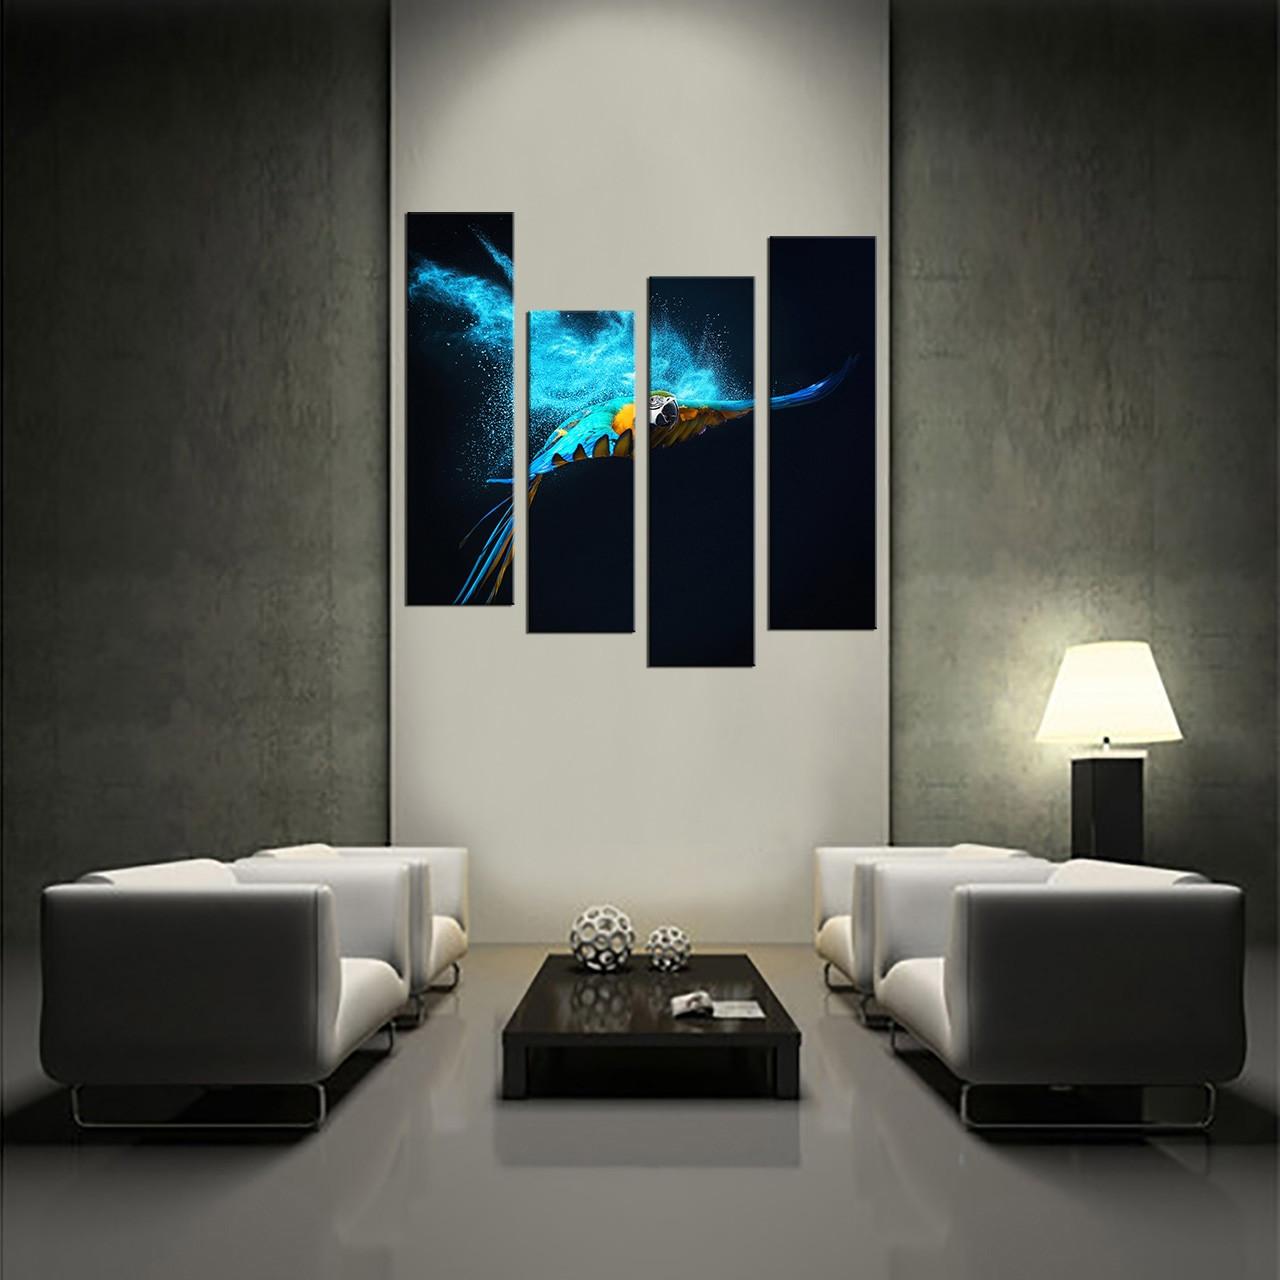 Multi Panel Canvas Wall Art 4 piece multi panel canvas, blue parrot canvas photography, parrot